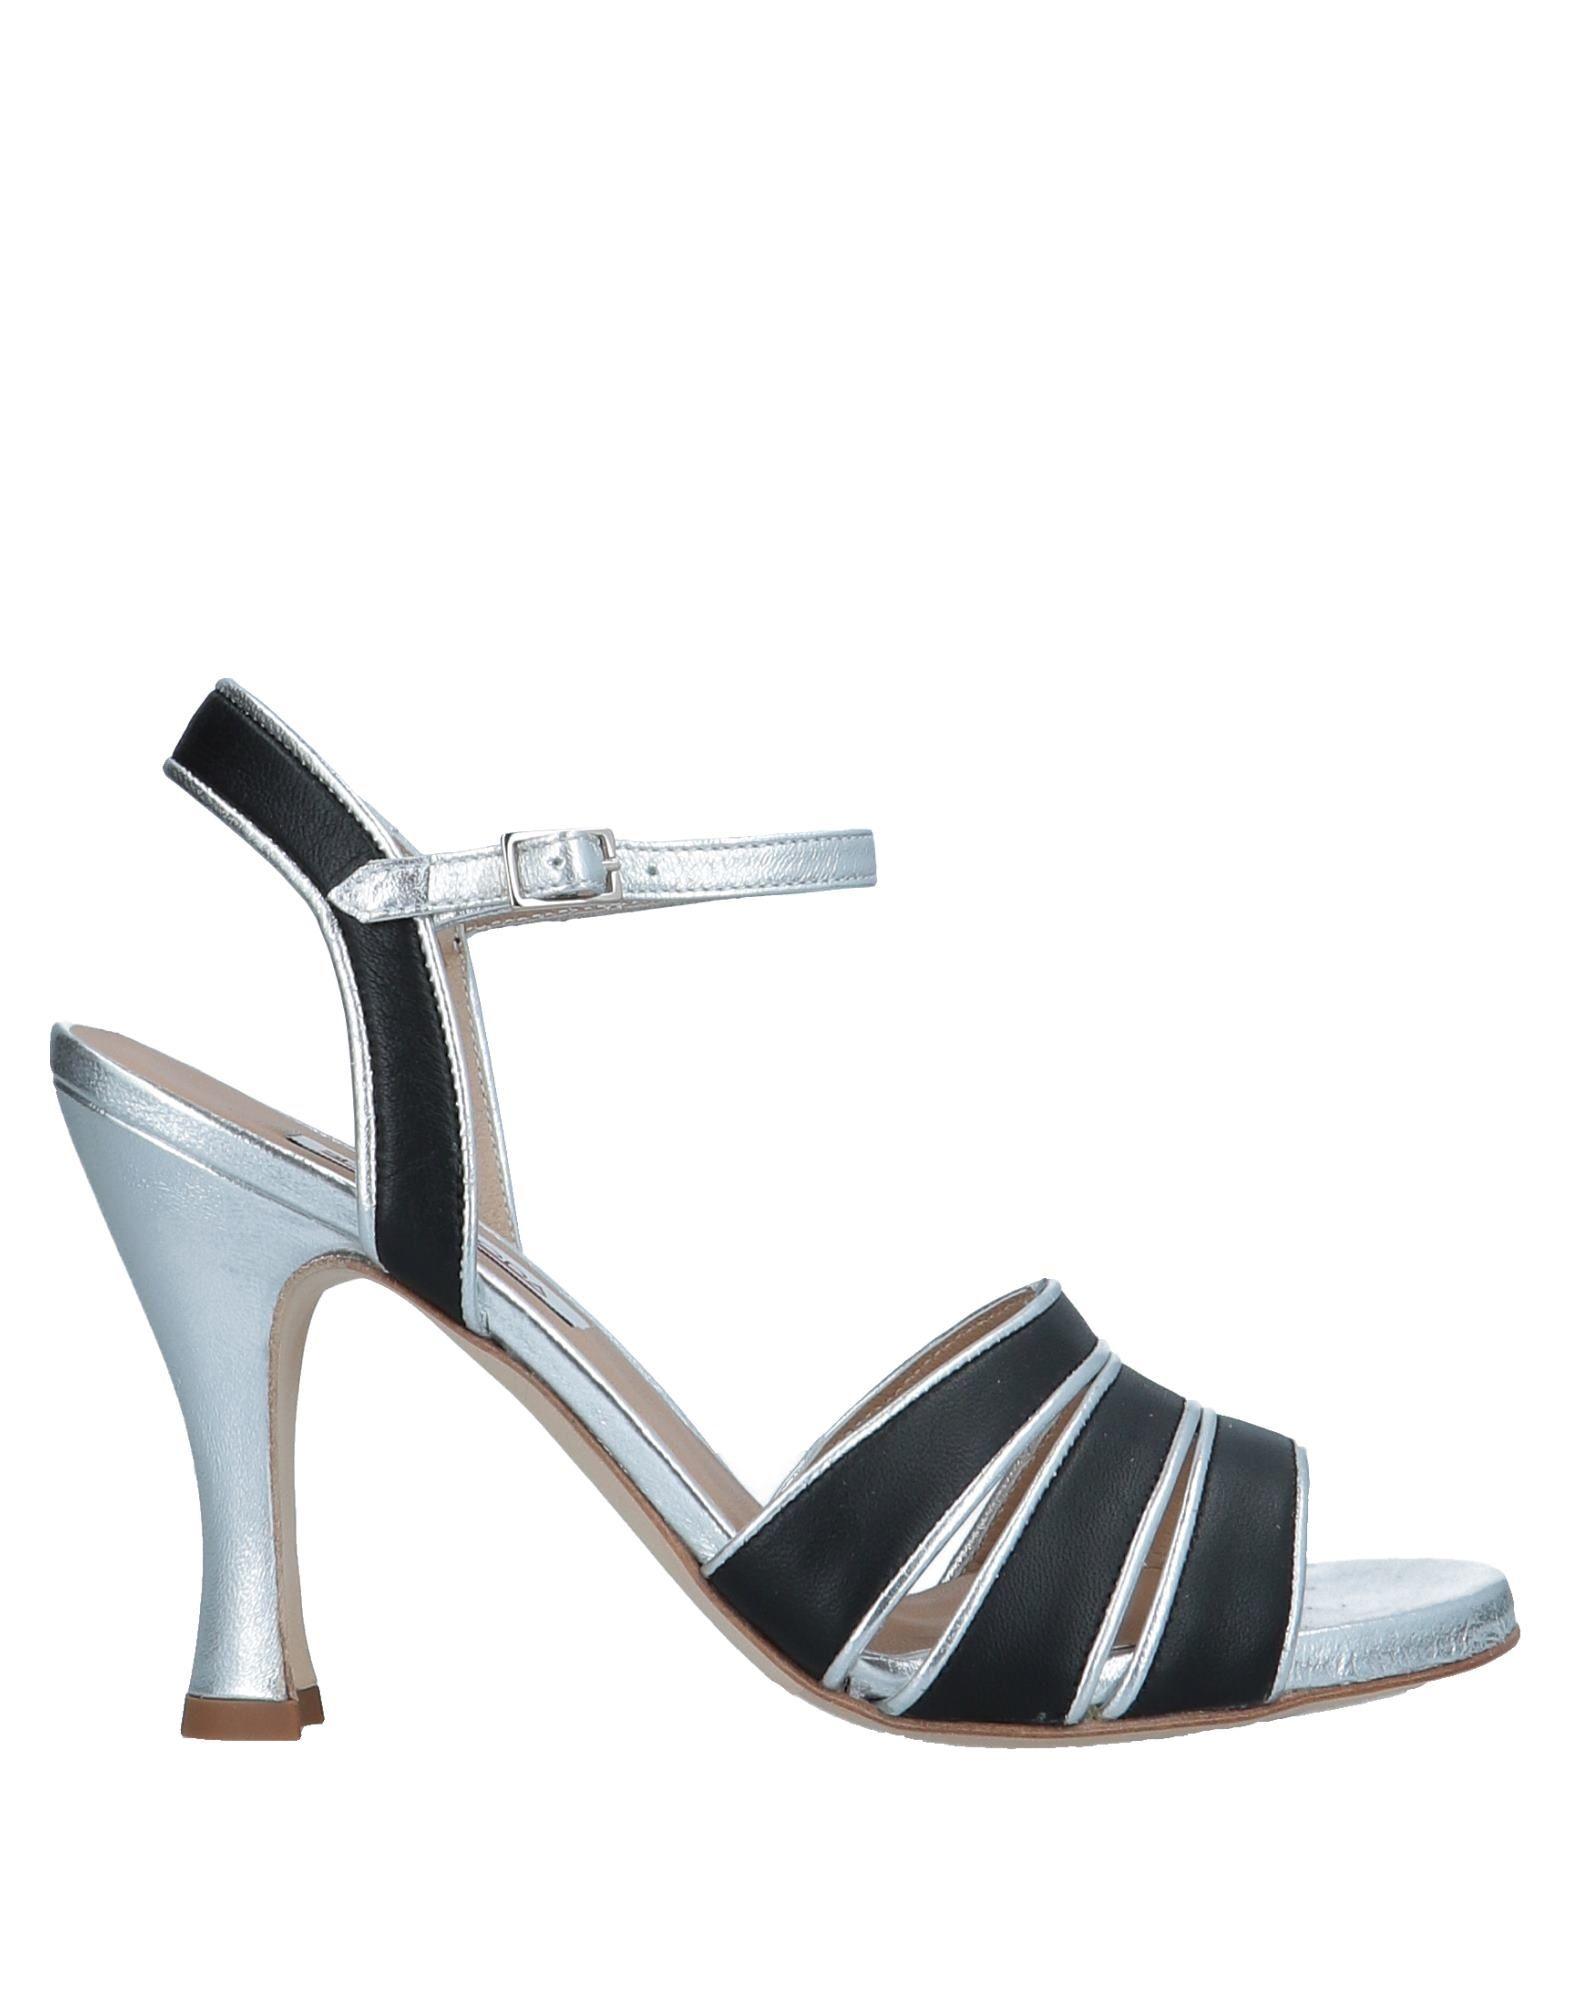 spaziomoda sandales - femmes spaziomoda sandales en ligne sur sur sur canada - 11572859xa 97307e